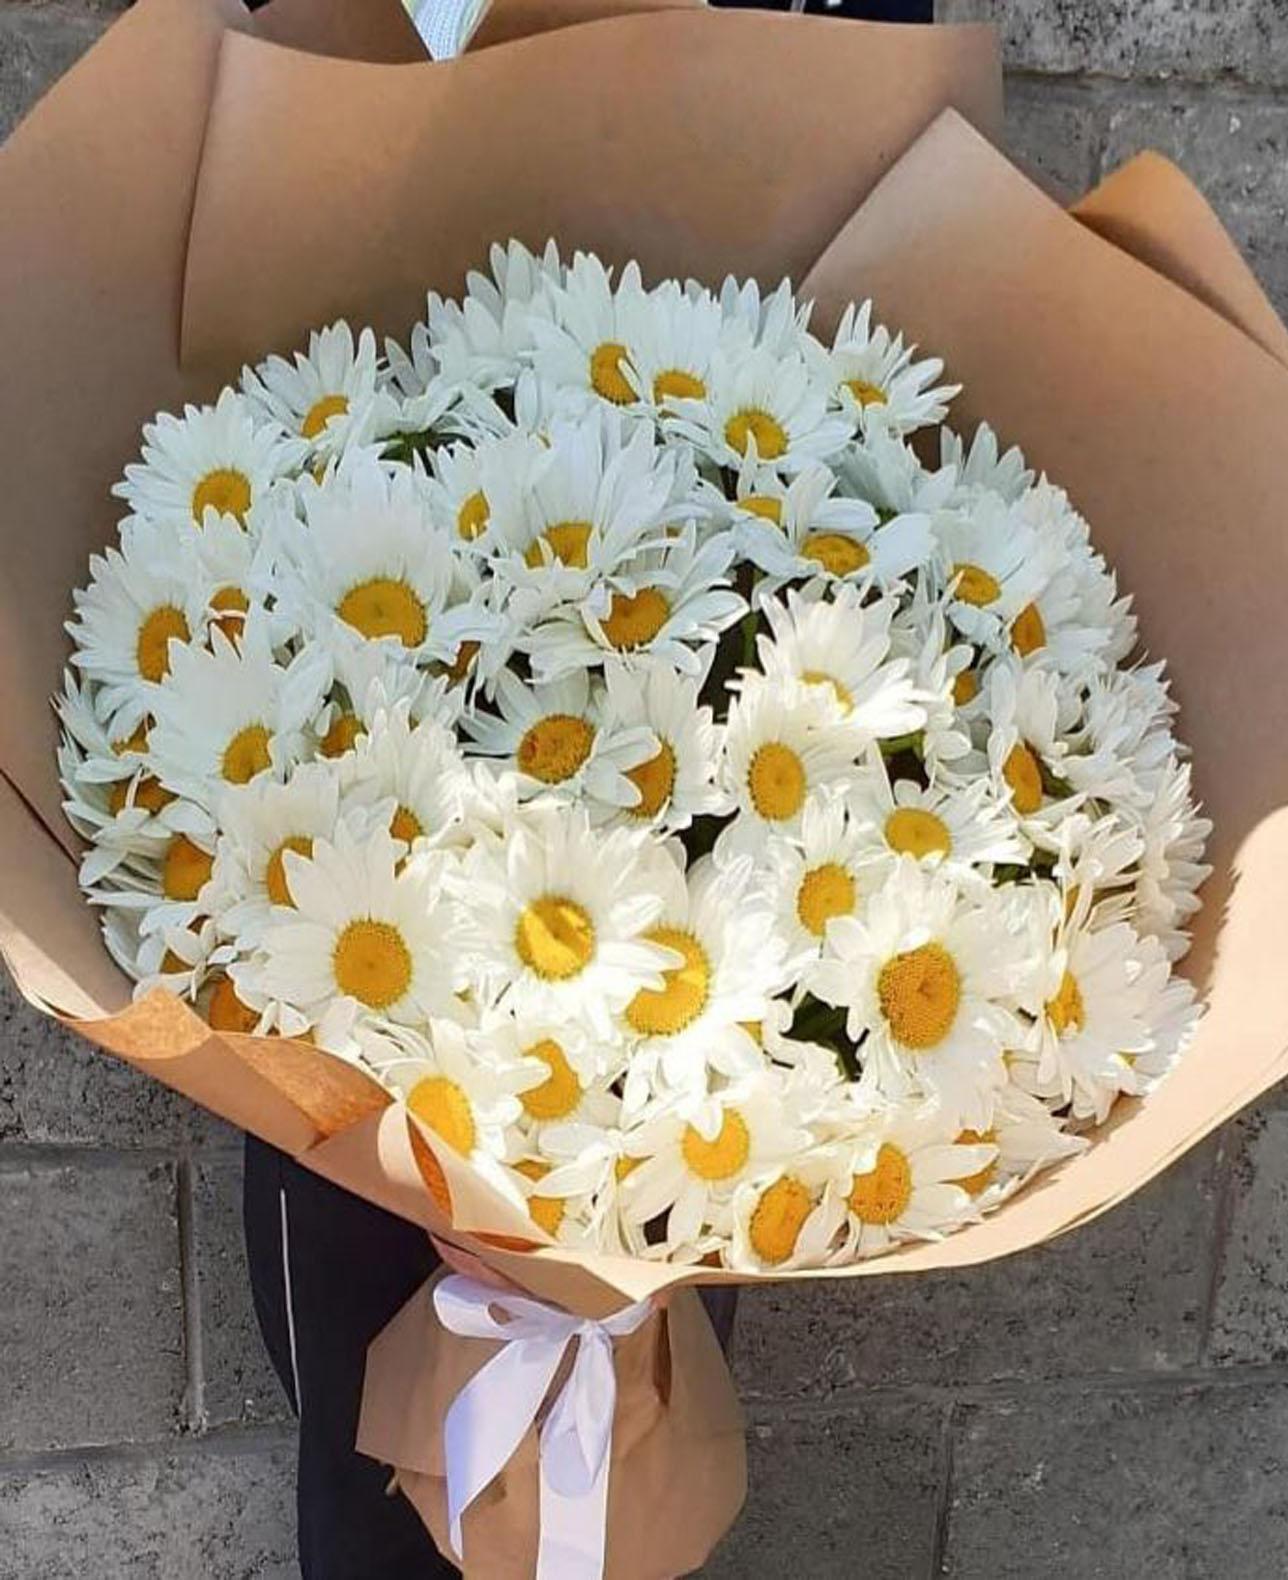 Доставка цветов одесса ромашки минск